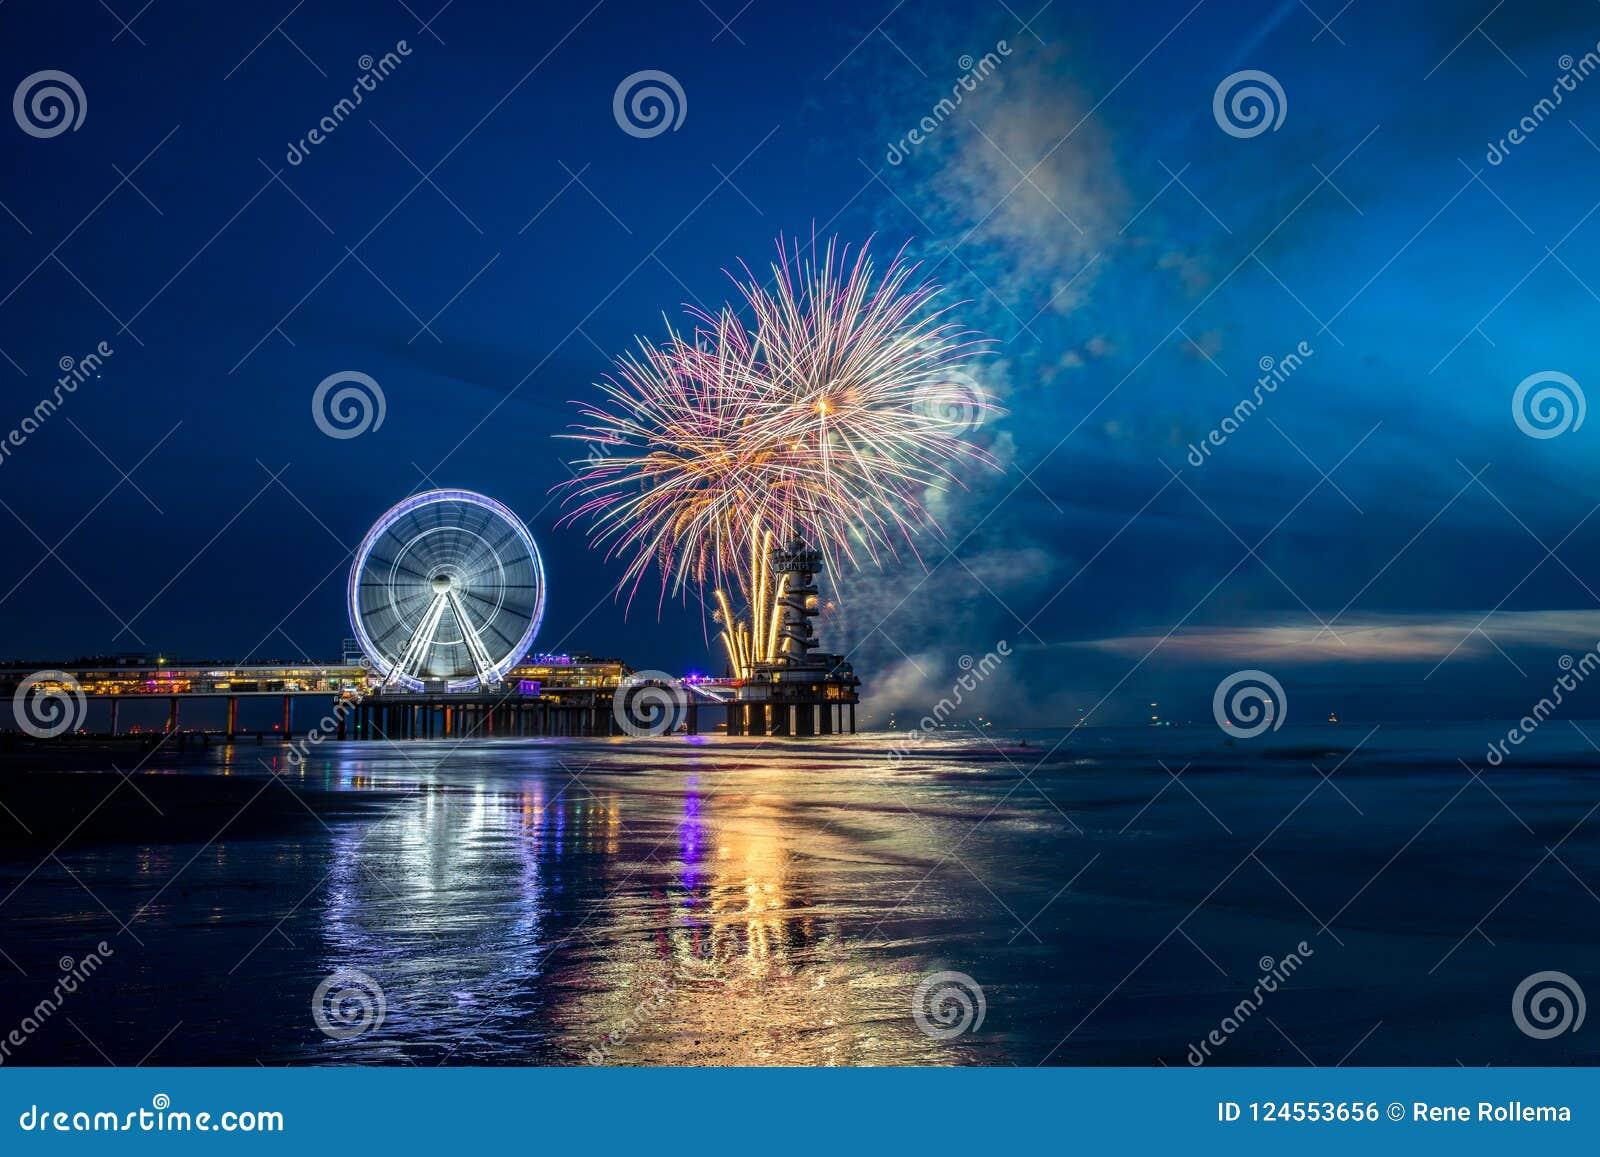 Fireworks Festival Scheveningen